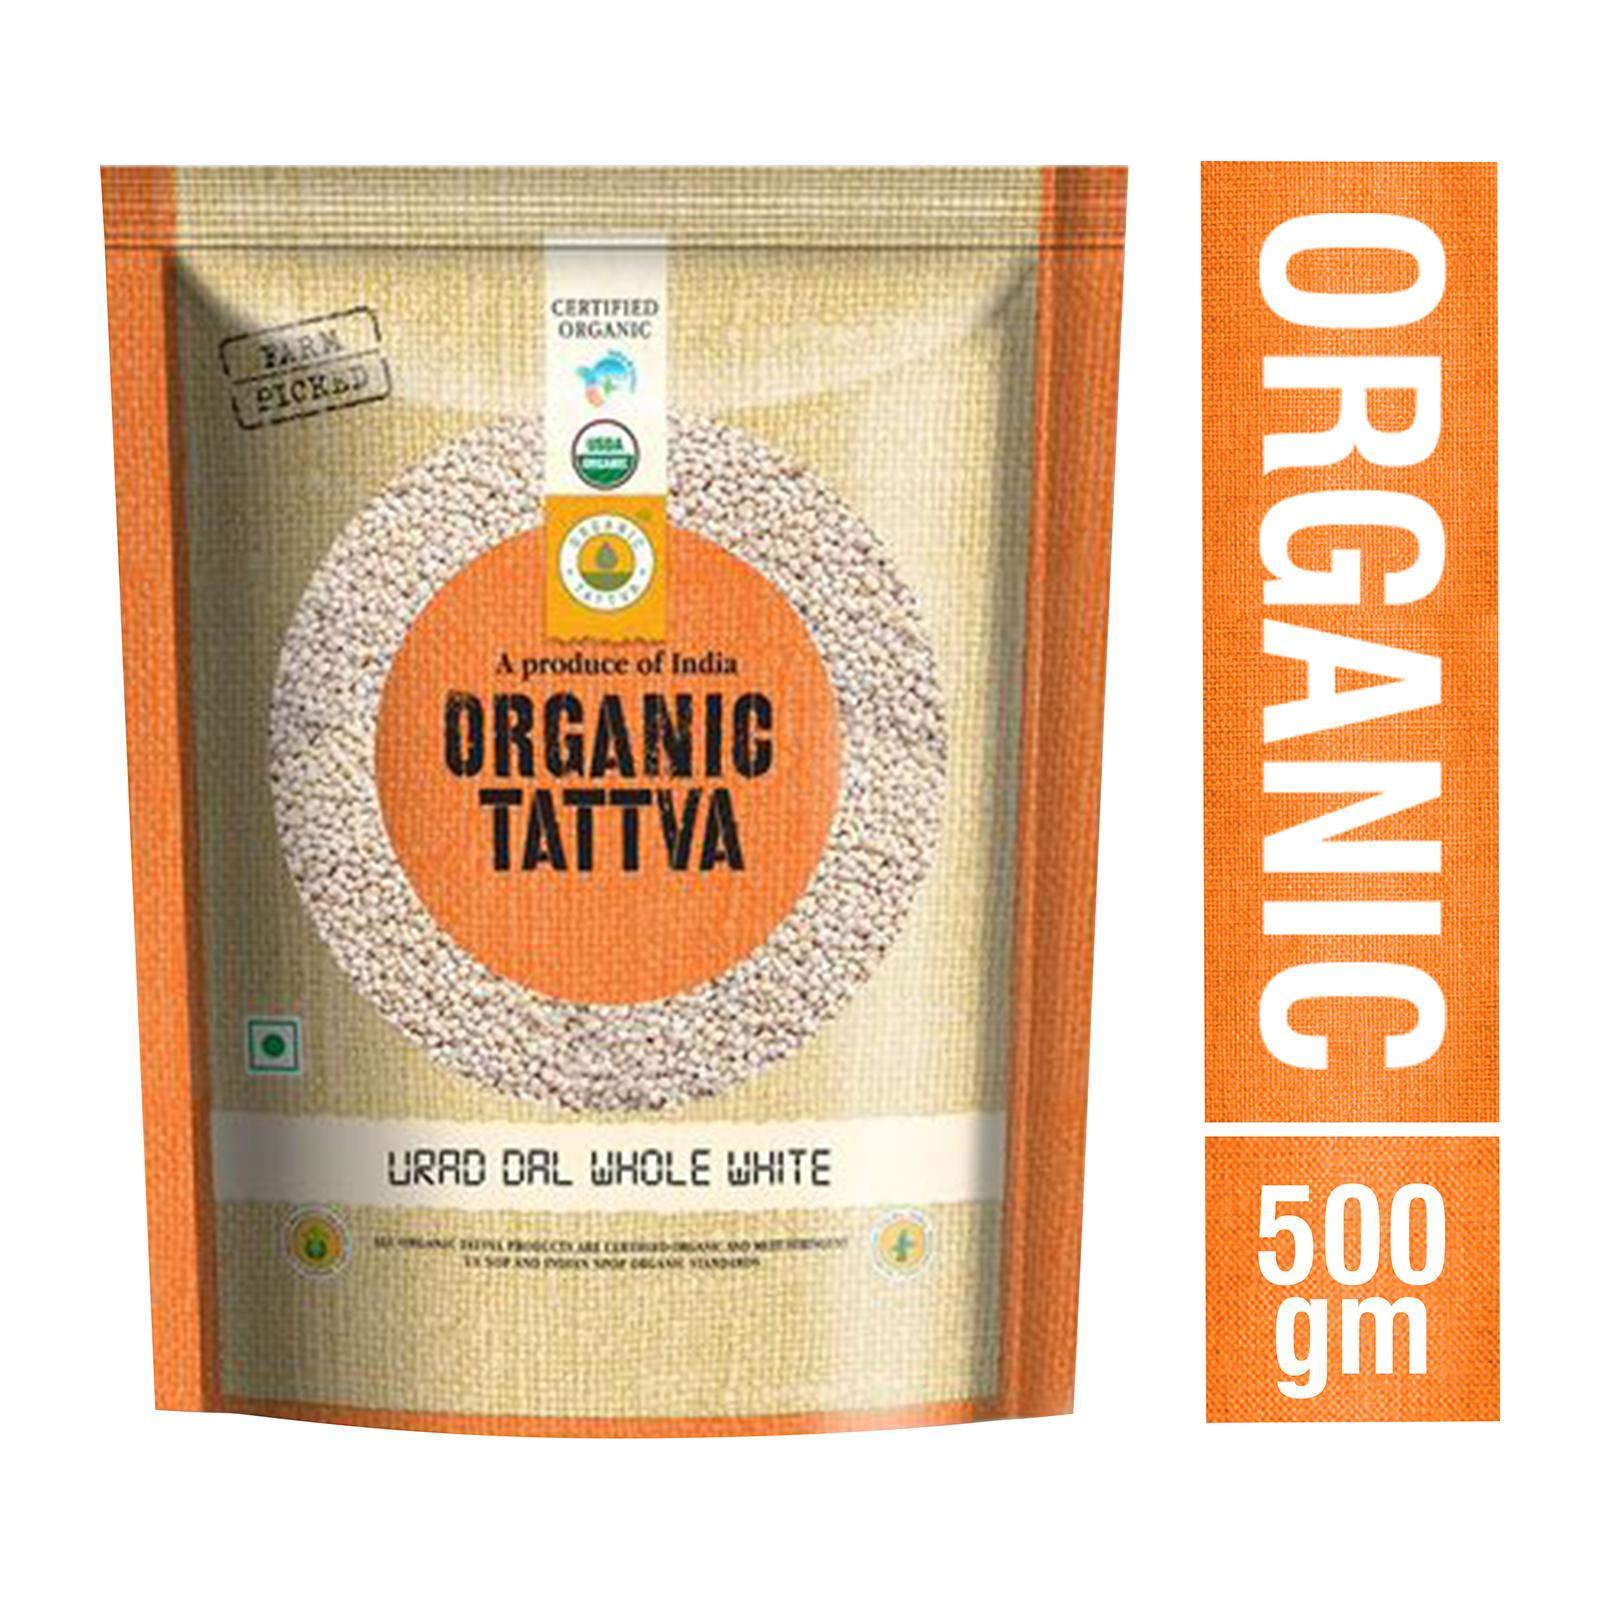 Organic Tattva Organic Urad Dal Whole White - By Sonnamera